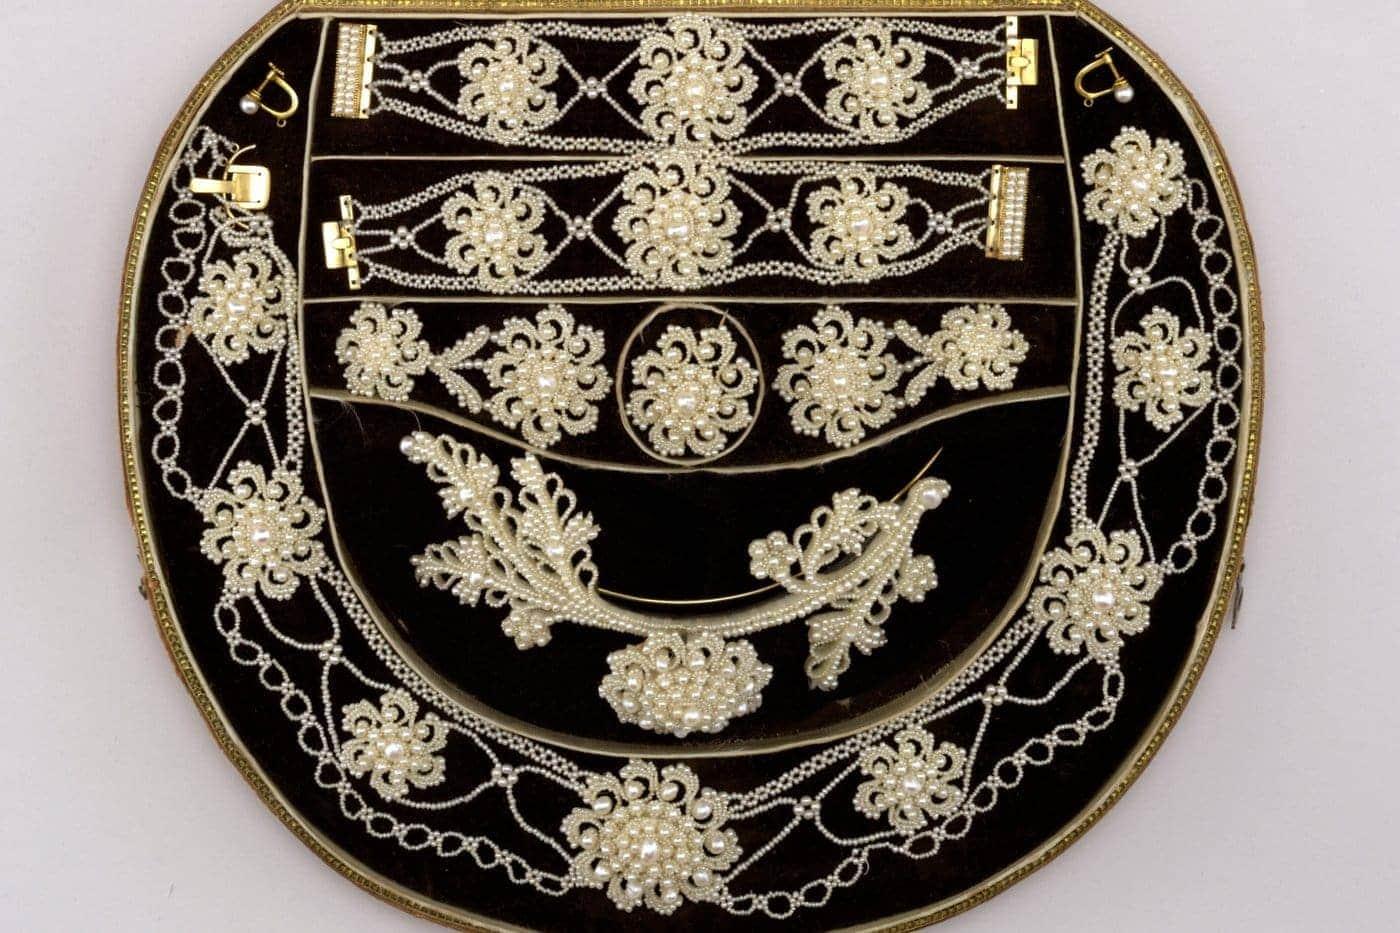 Antique jewelry - sunburst-ornaments of seed pearls c1830s - Via Smithsonian